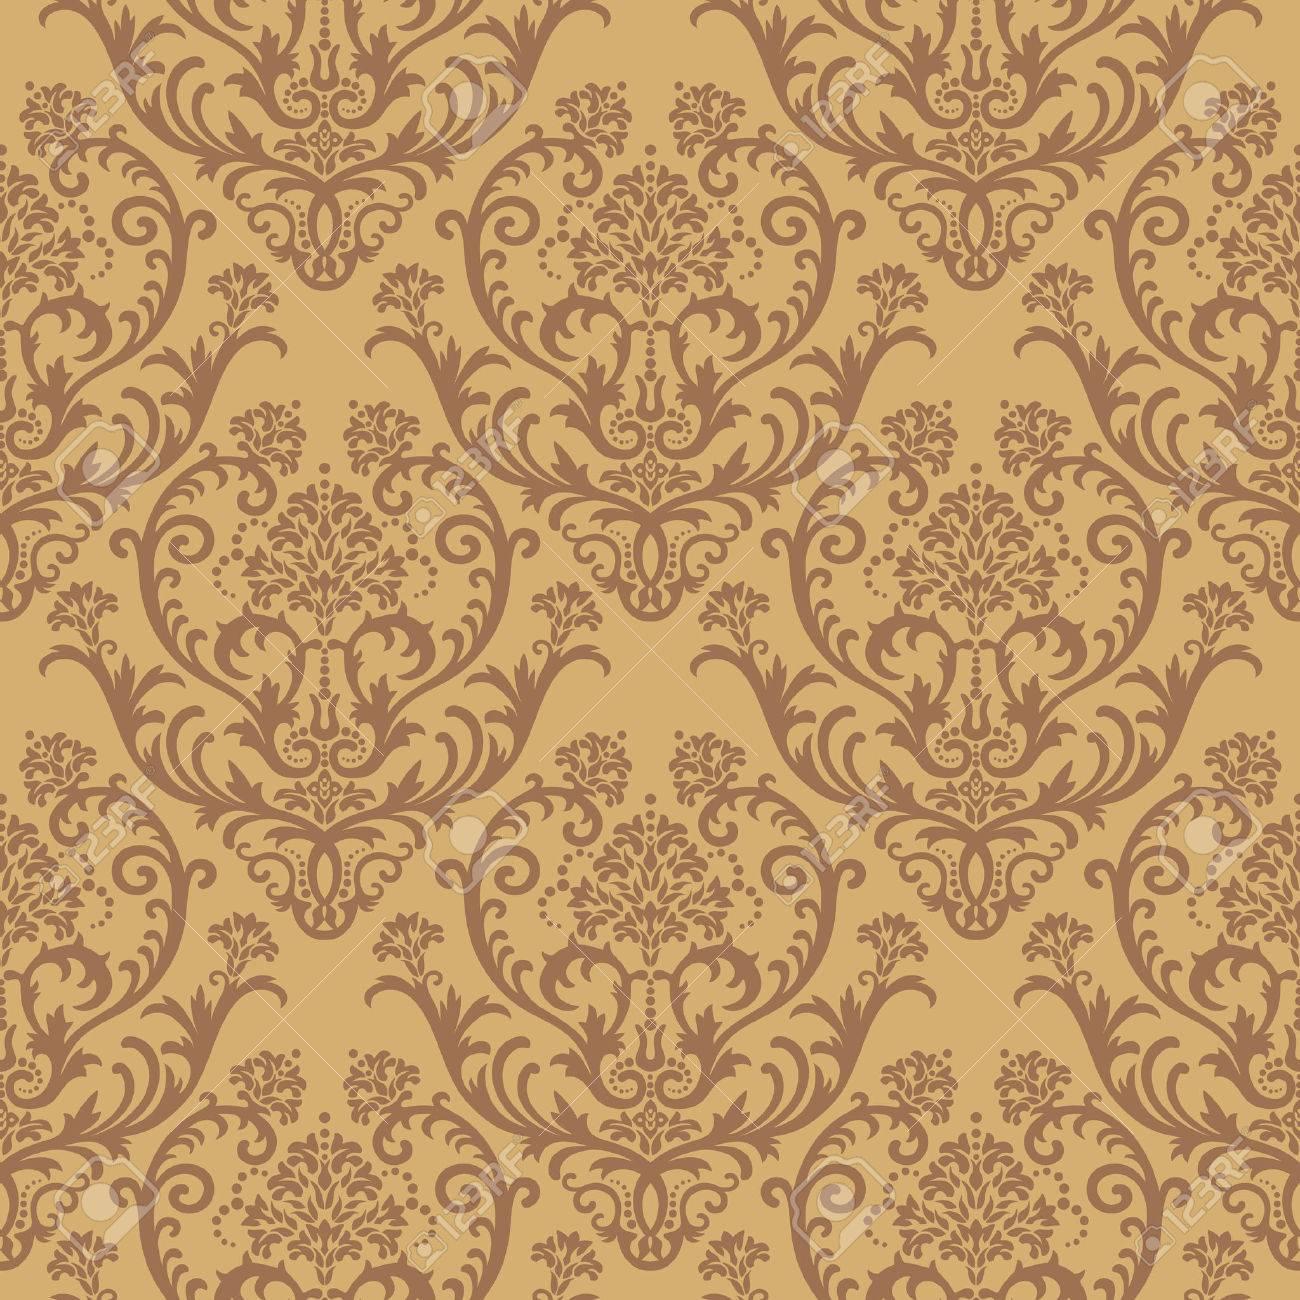 Seamless brown floral damask wallpaper Stock Vector - 5914791